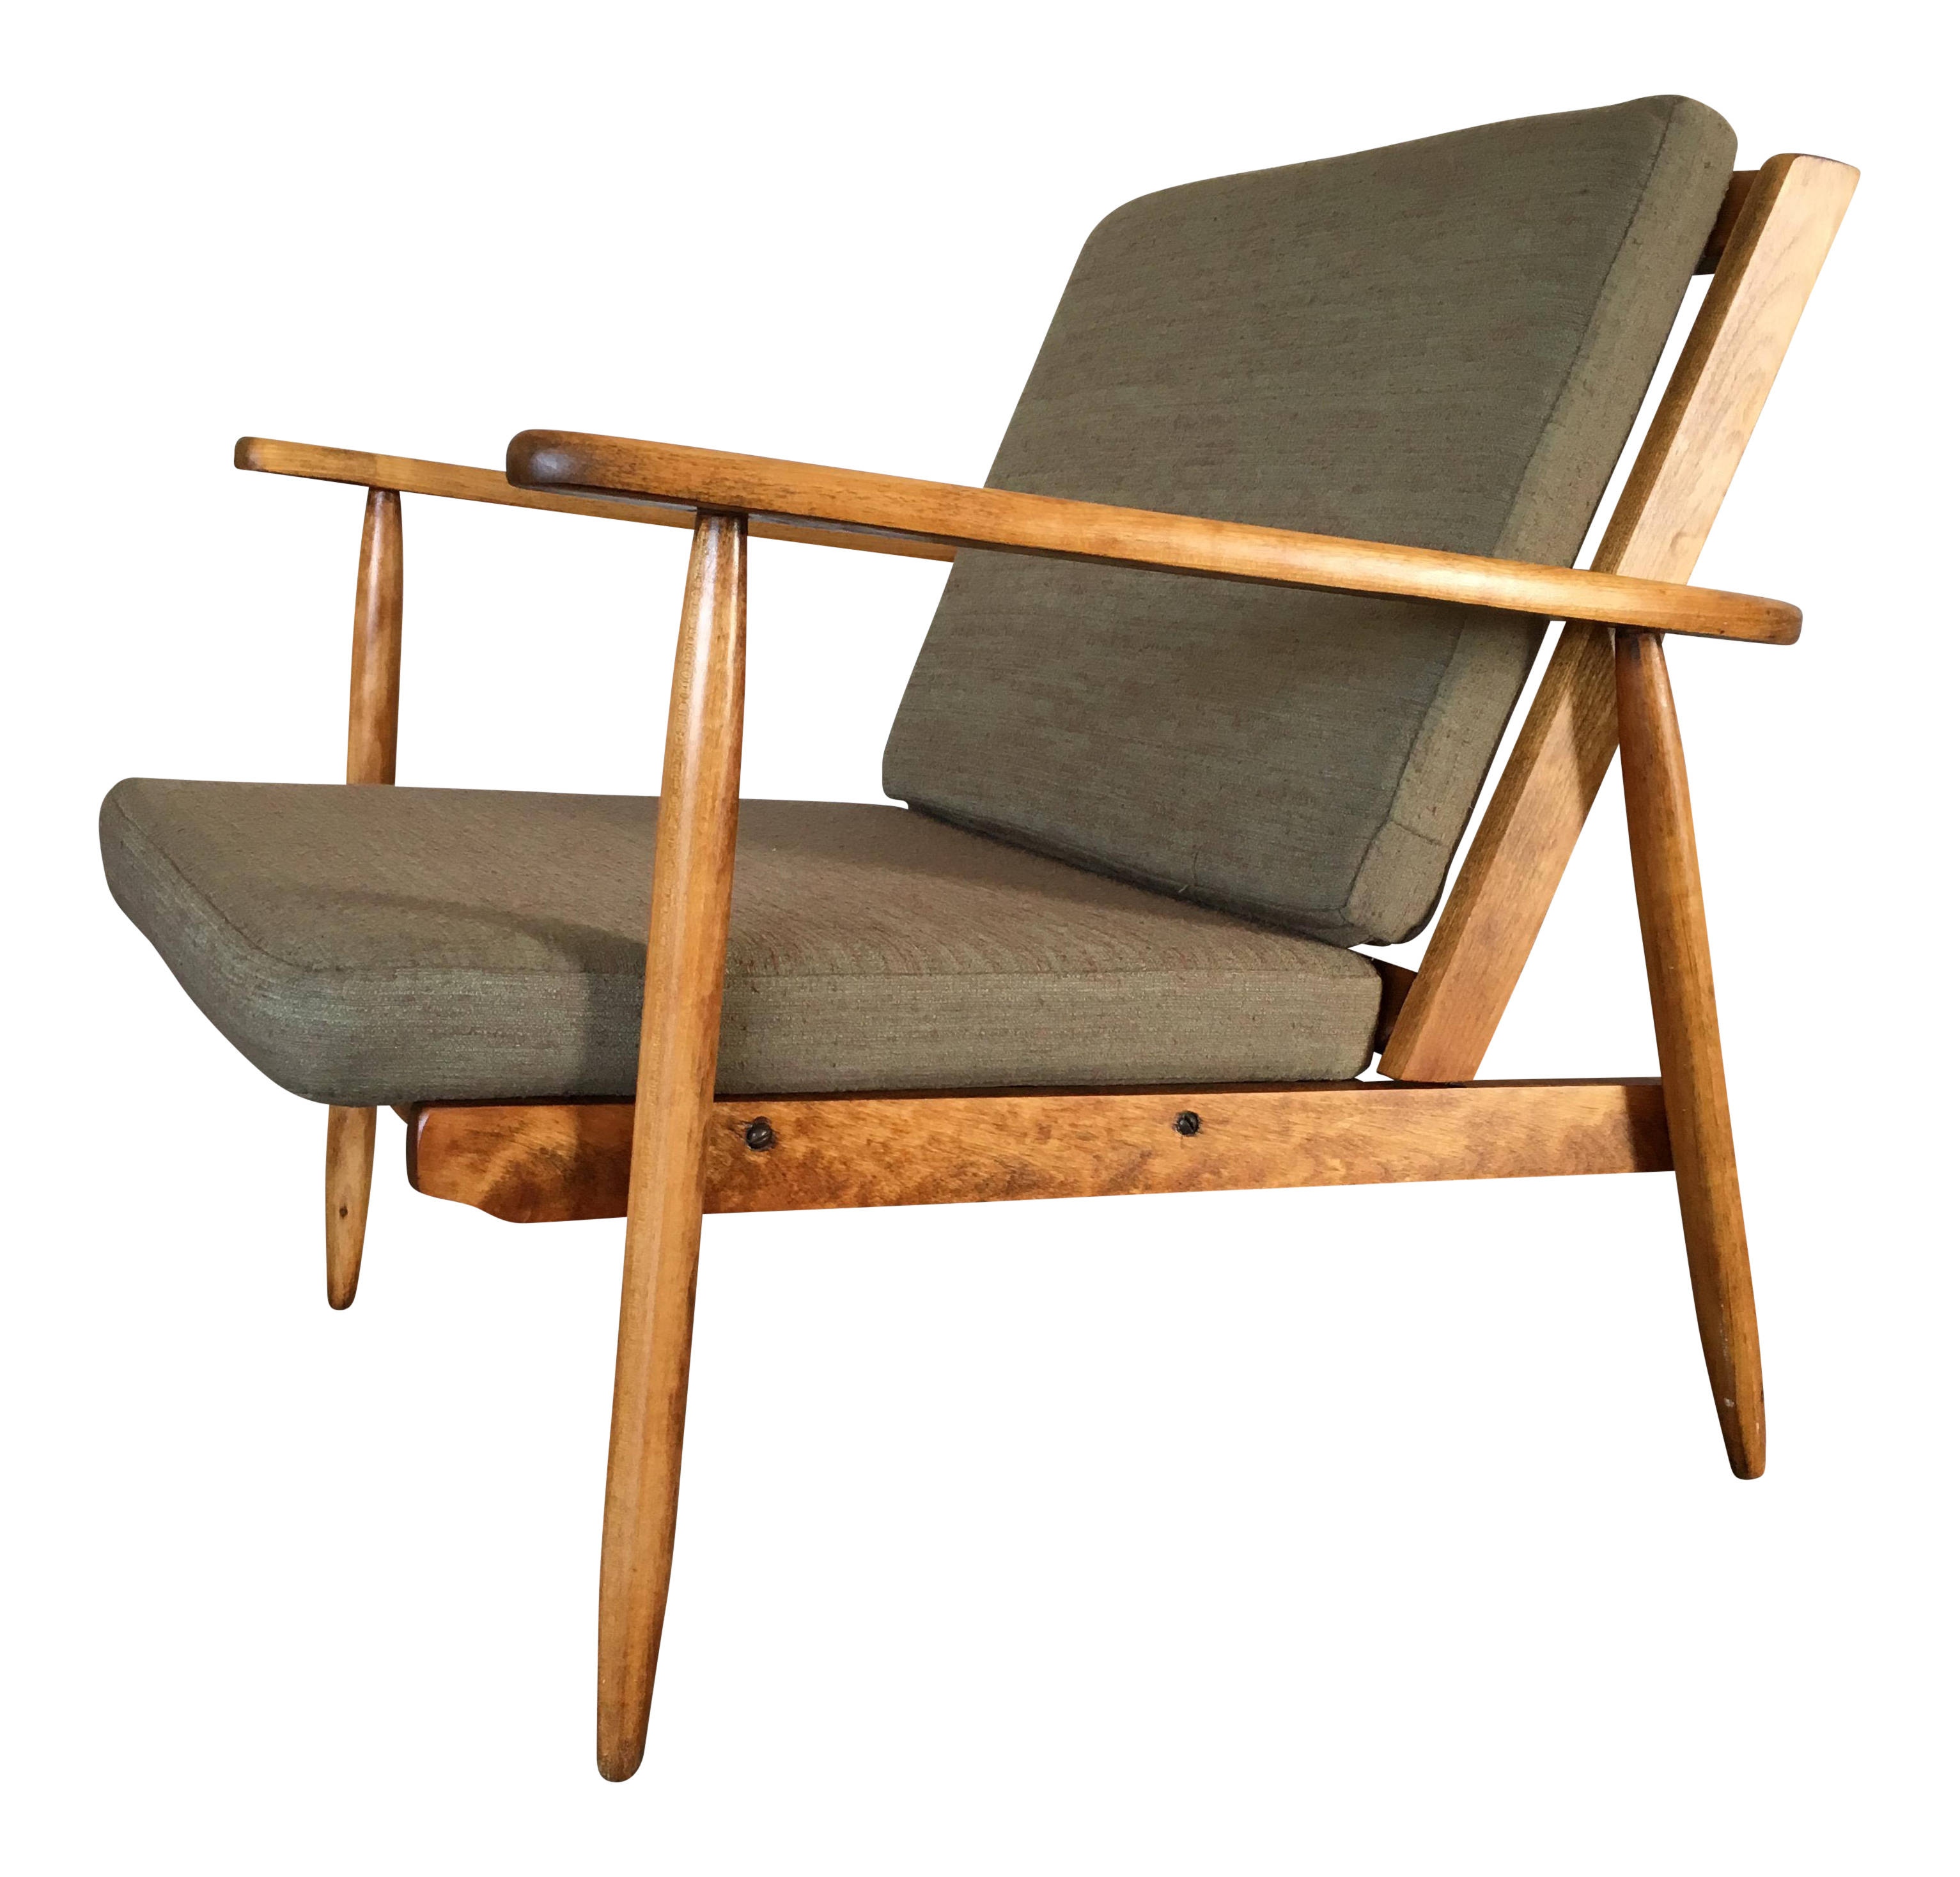 Danish Modern Style Lounge Arm Chair on Chairish.com